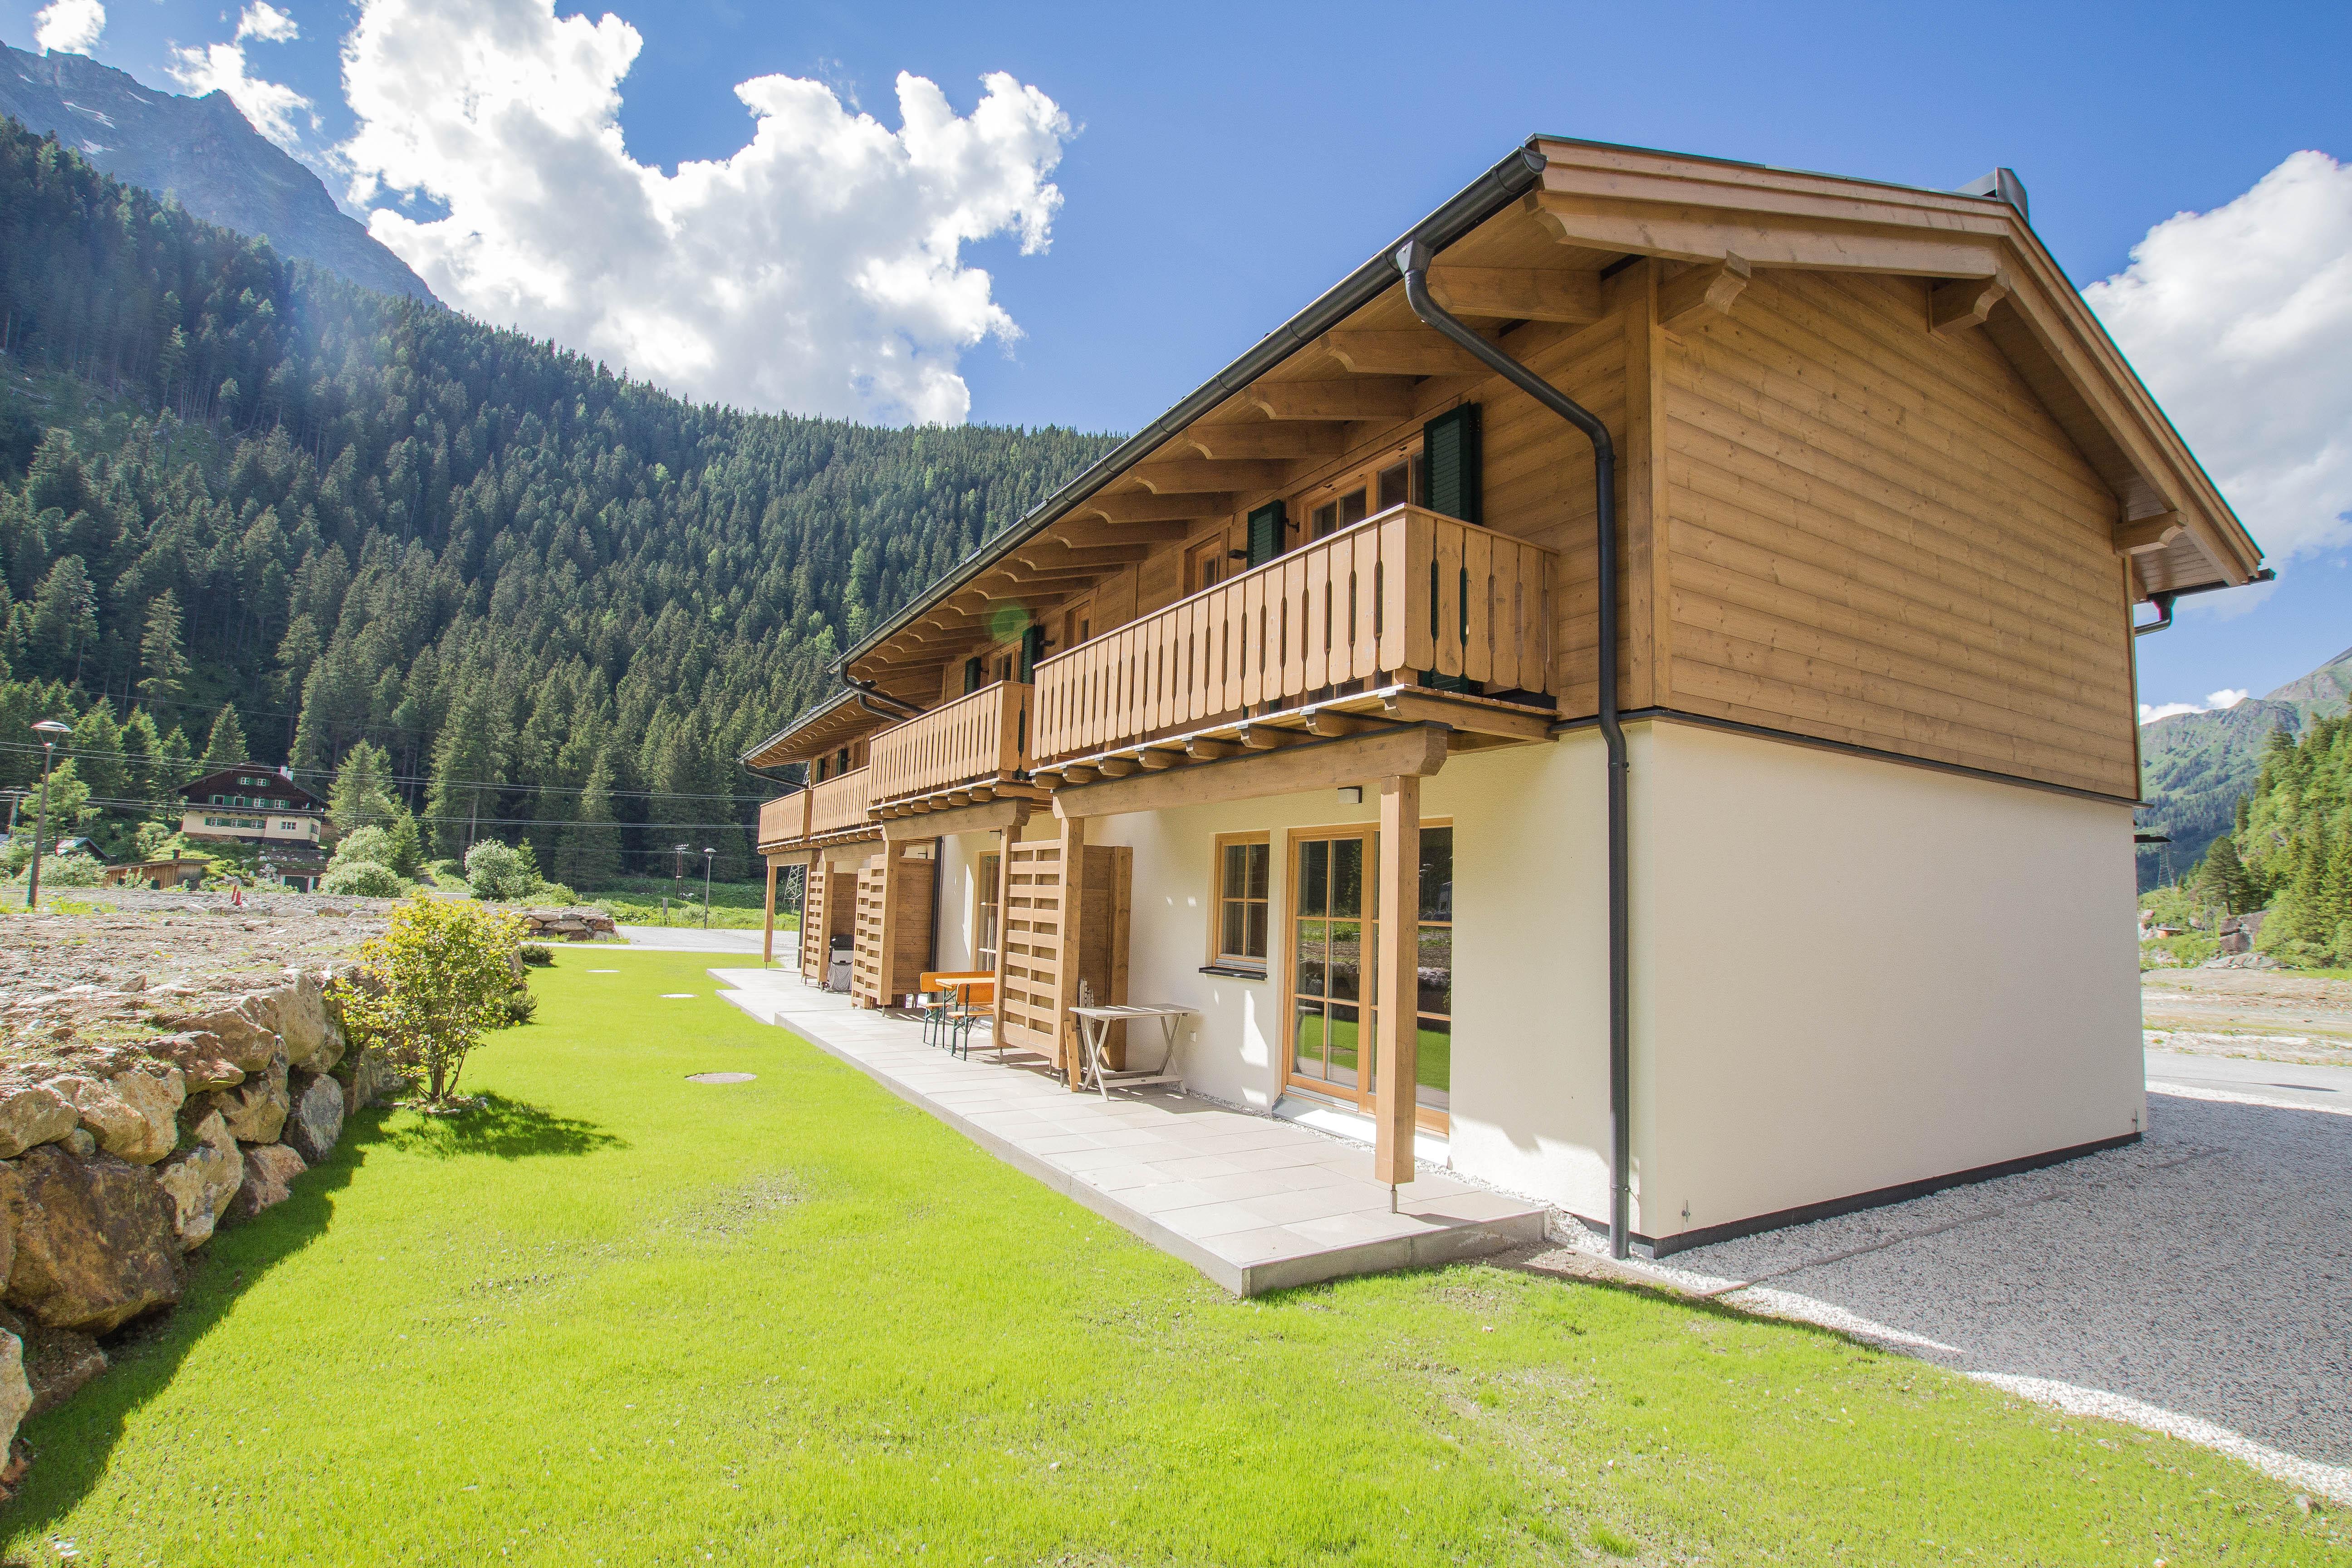 Maison de vacances Lodge Kleiner Bär direkt am Skilift (2050394), Uttendorf, Pinzgau, Salzbourg, Autriche, image 24